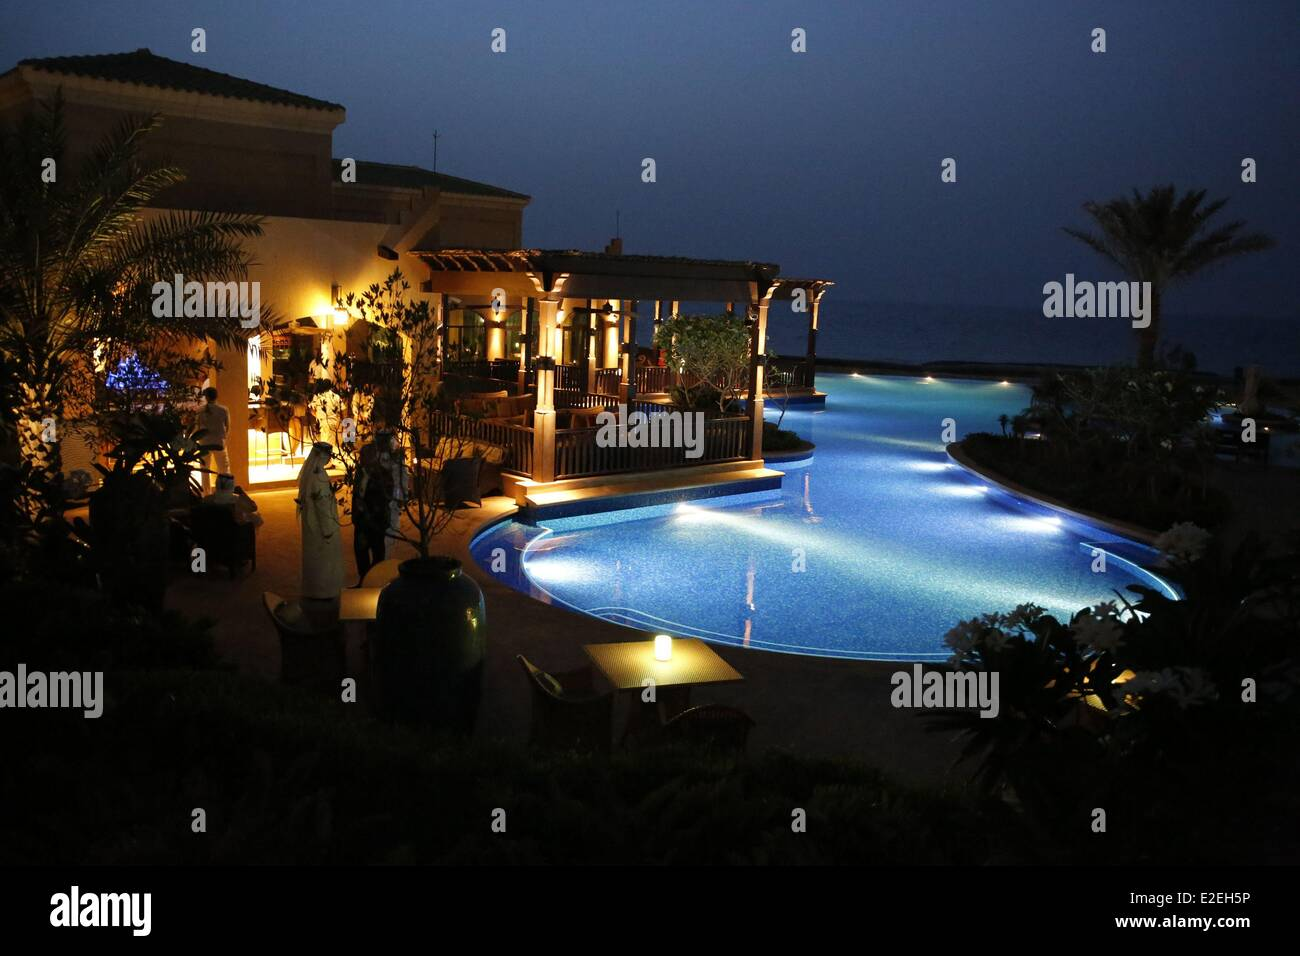 United Arab Emirates, Abu Dhabi, Sir Bani Yas island, the luxury Desert island resort by Anantara - Stock Image